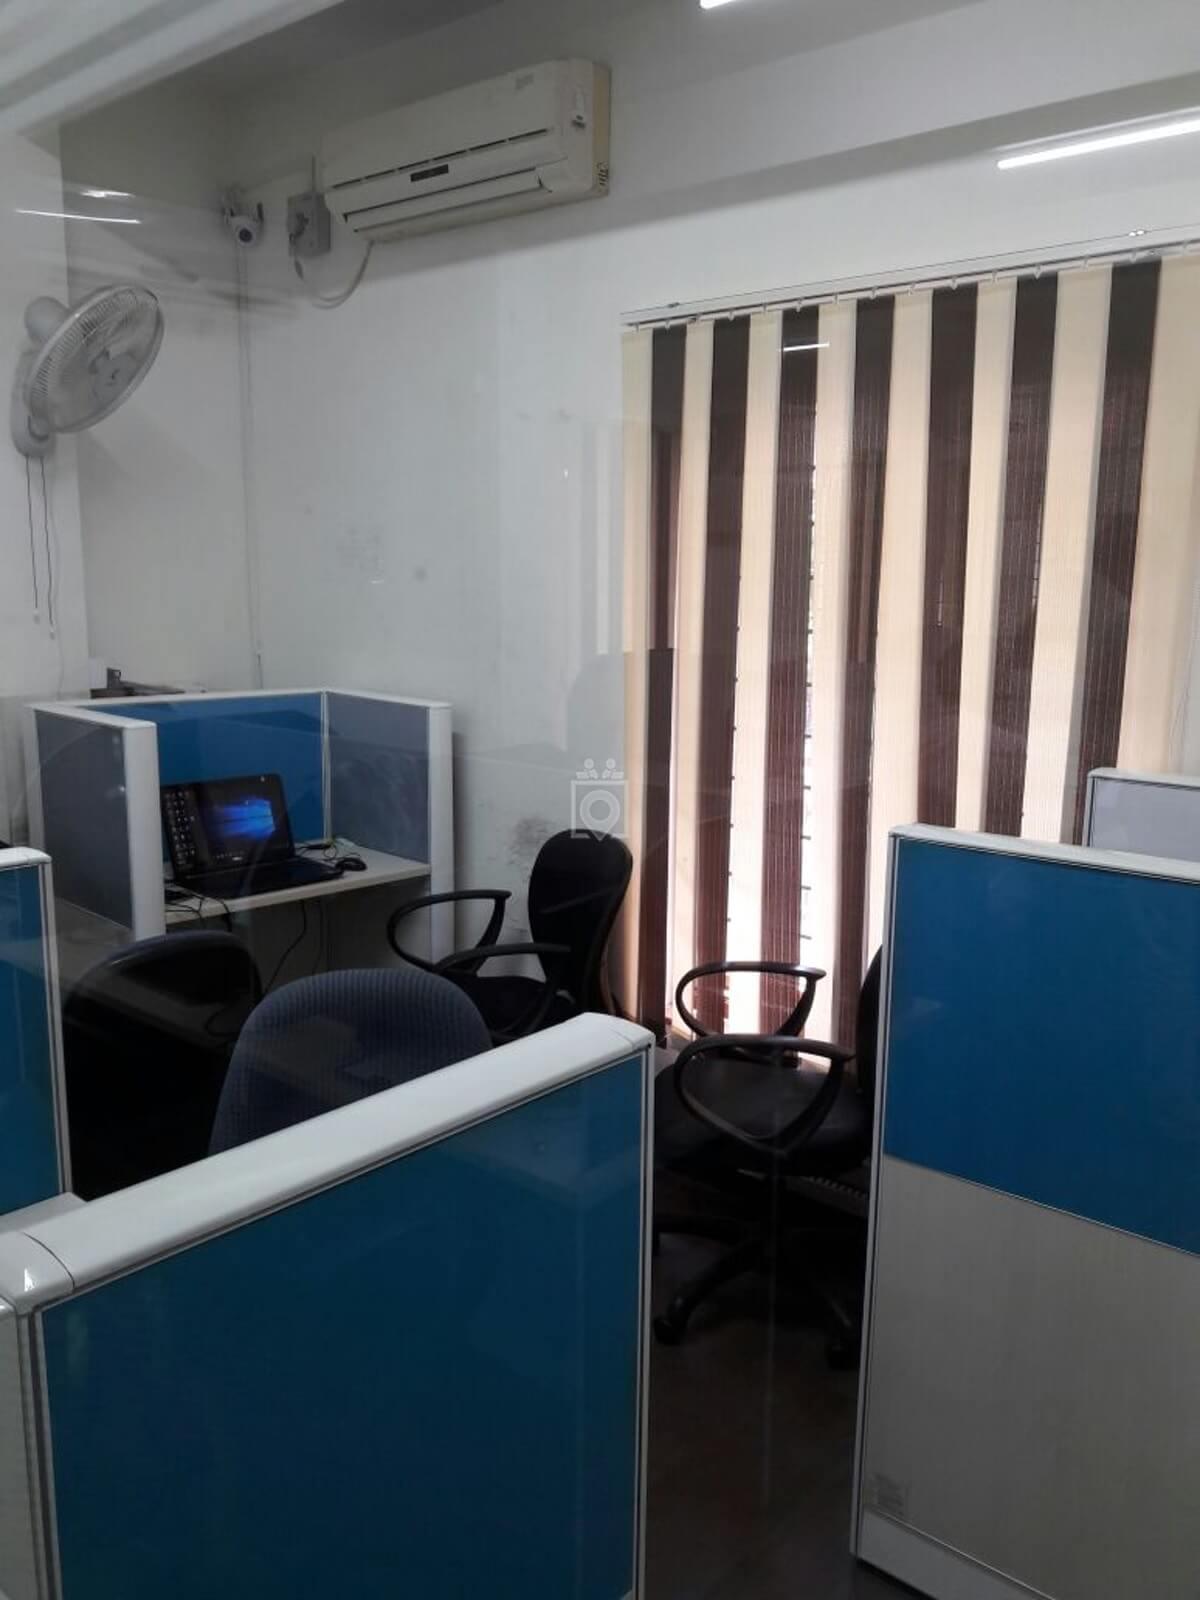 AltSpace Technologies